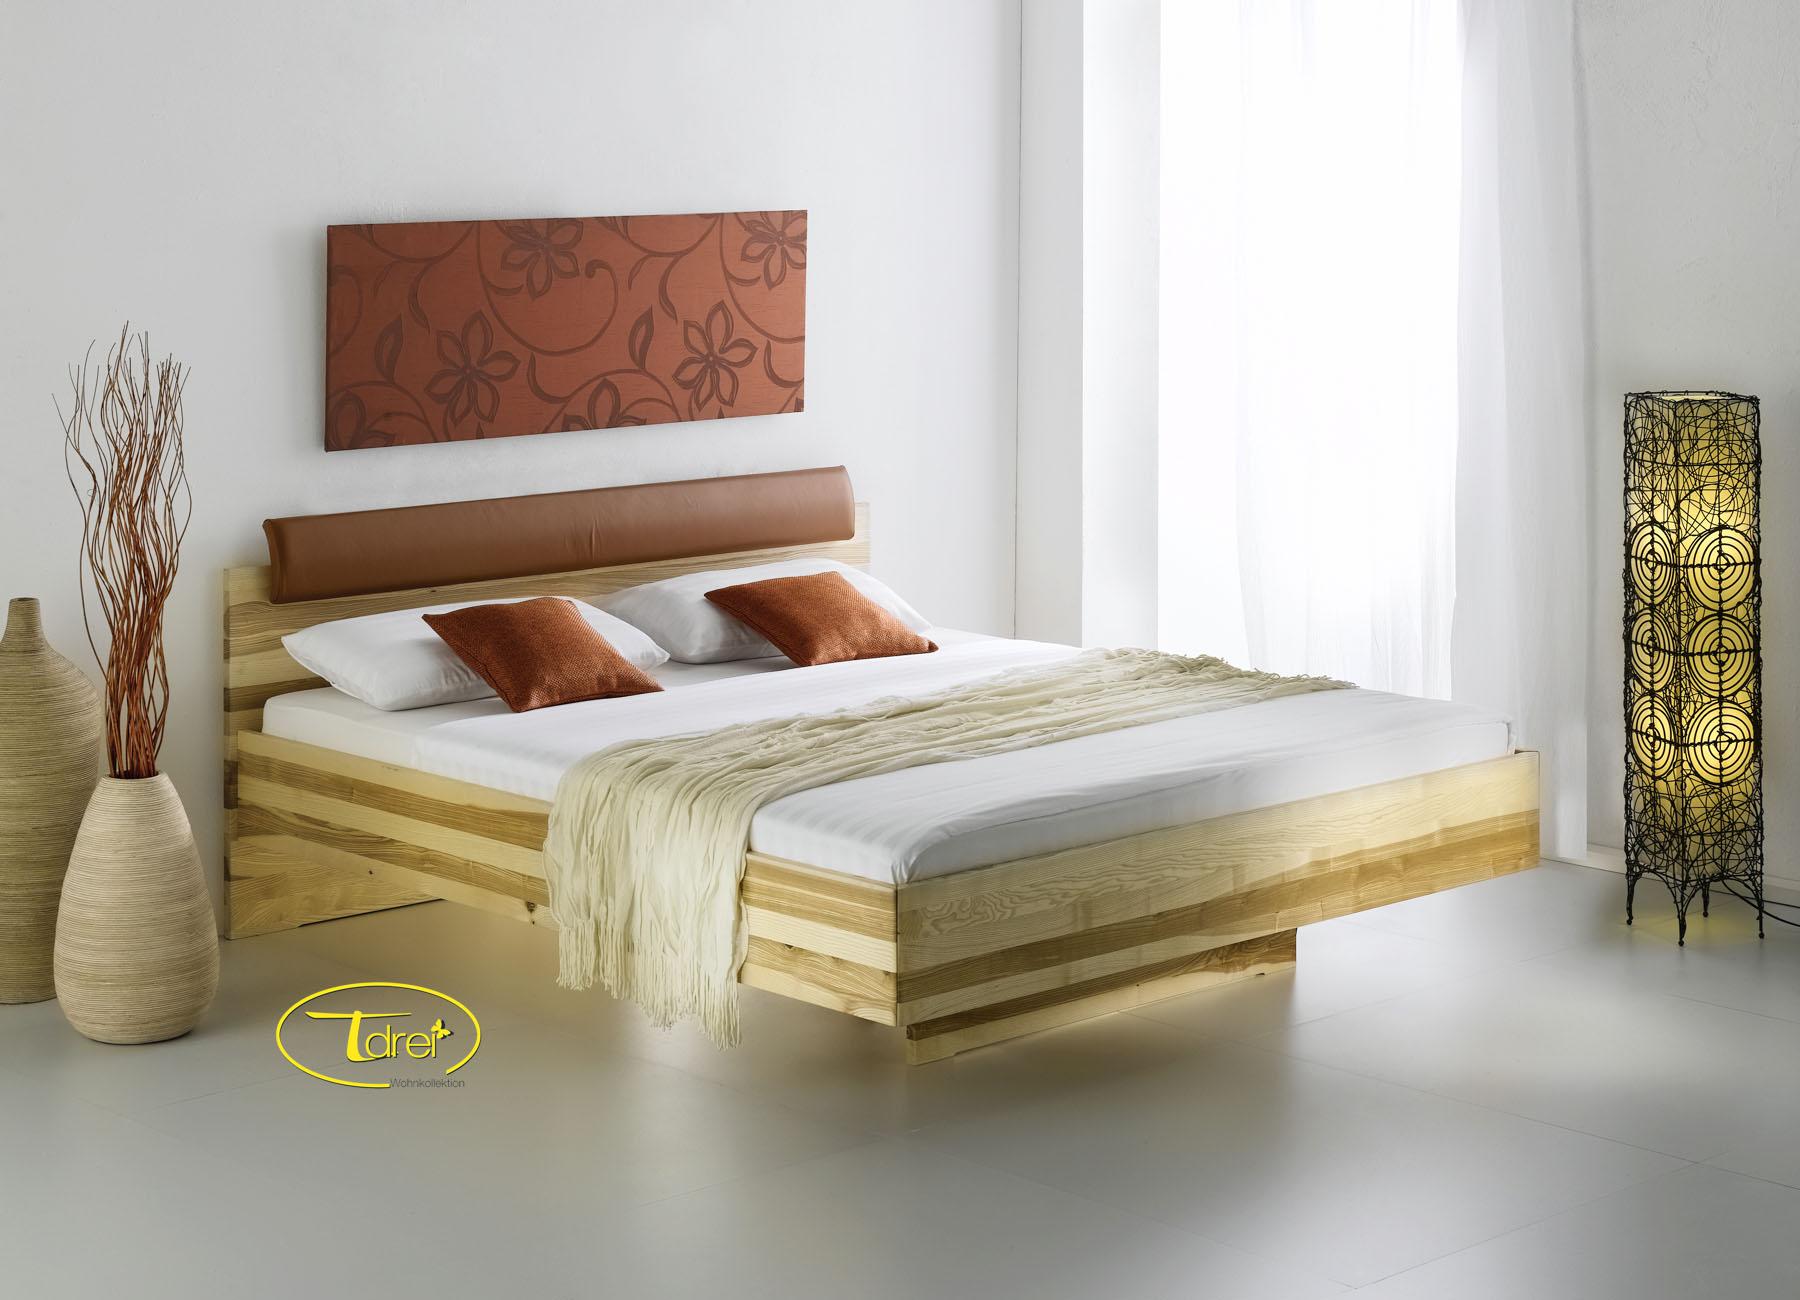 Full Size of Designer Betten Paradies Massivholz Teenager 90x200 Trends Antike Bock Jugend Rauch 180x200 Amazon Bett Designer Betten